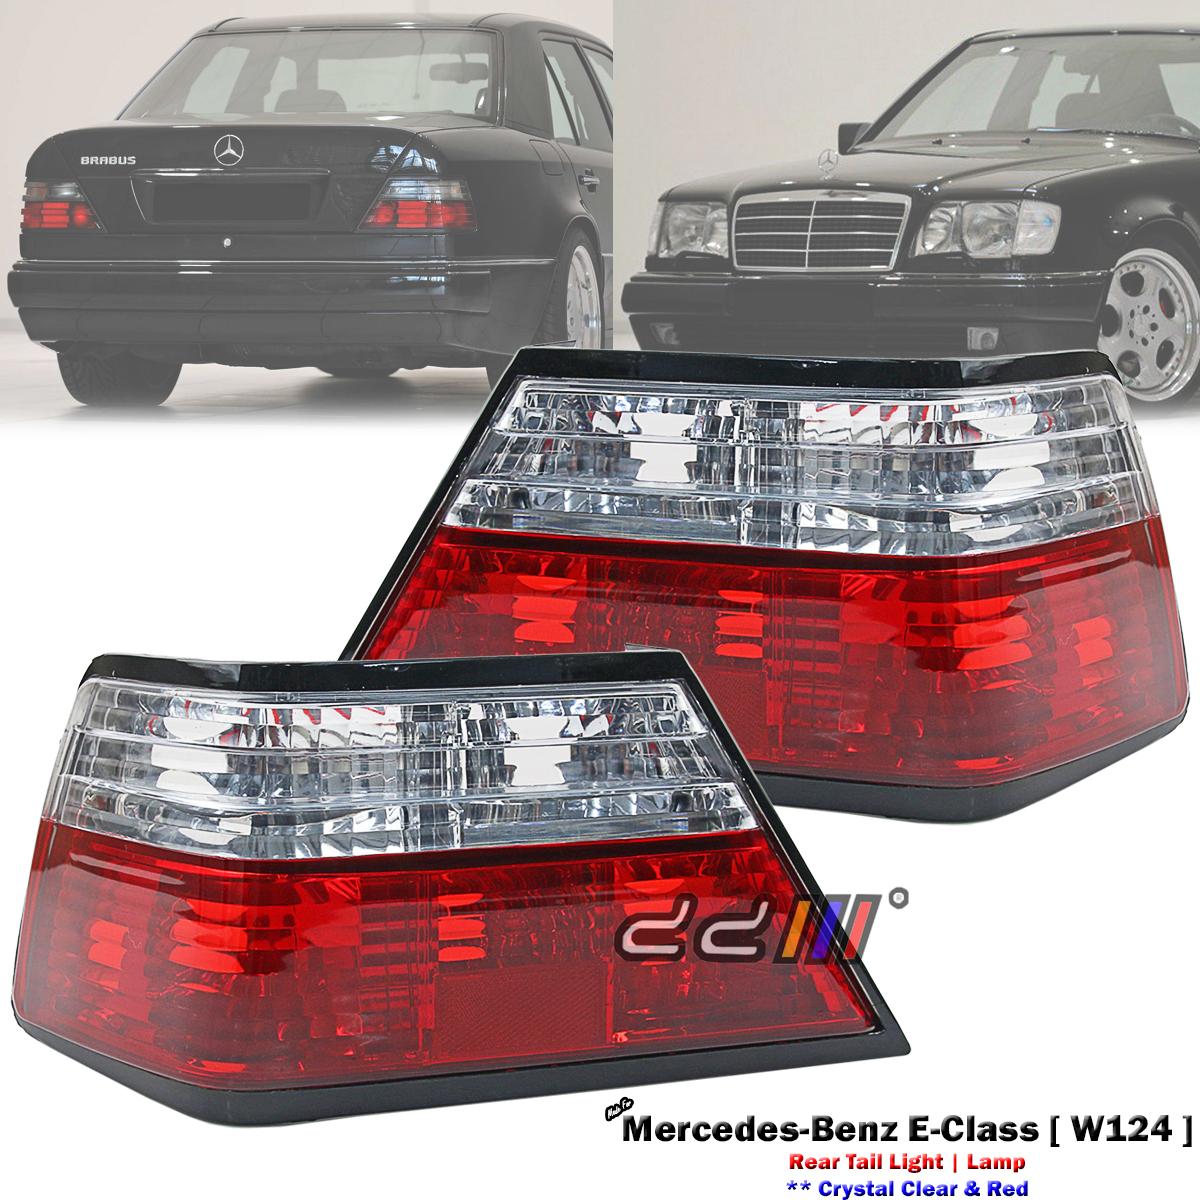 Details about  /Pair Rear Tail Light Lamp For Mercedes-Benz W124 E280 E320 E420 E500 1994-1996